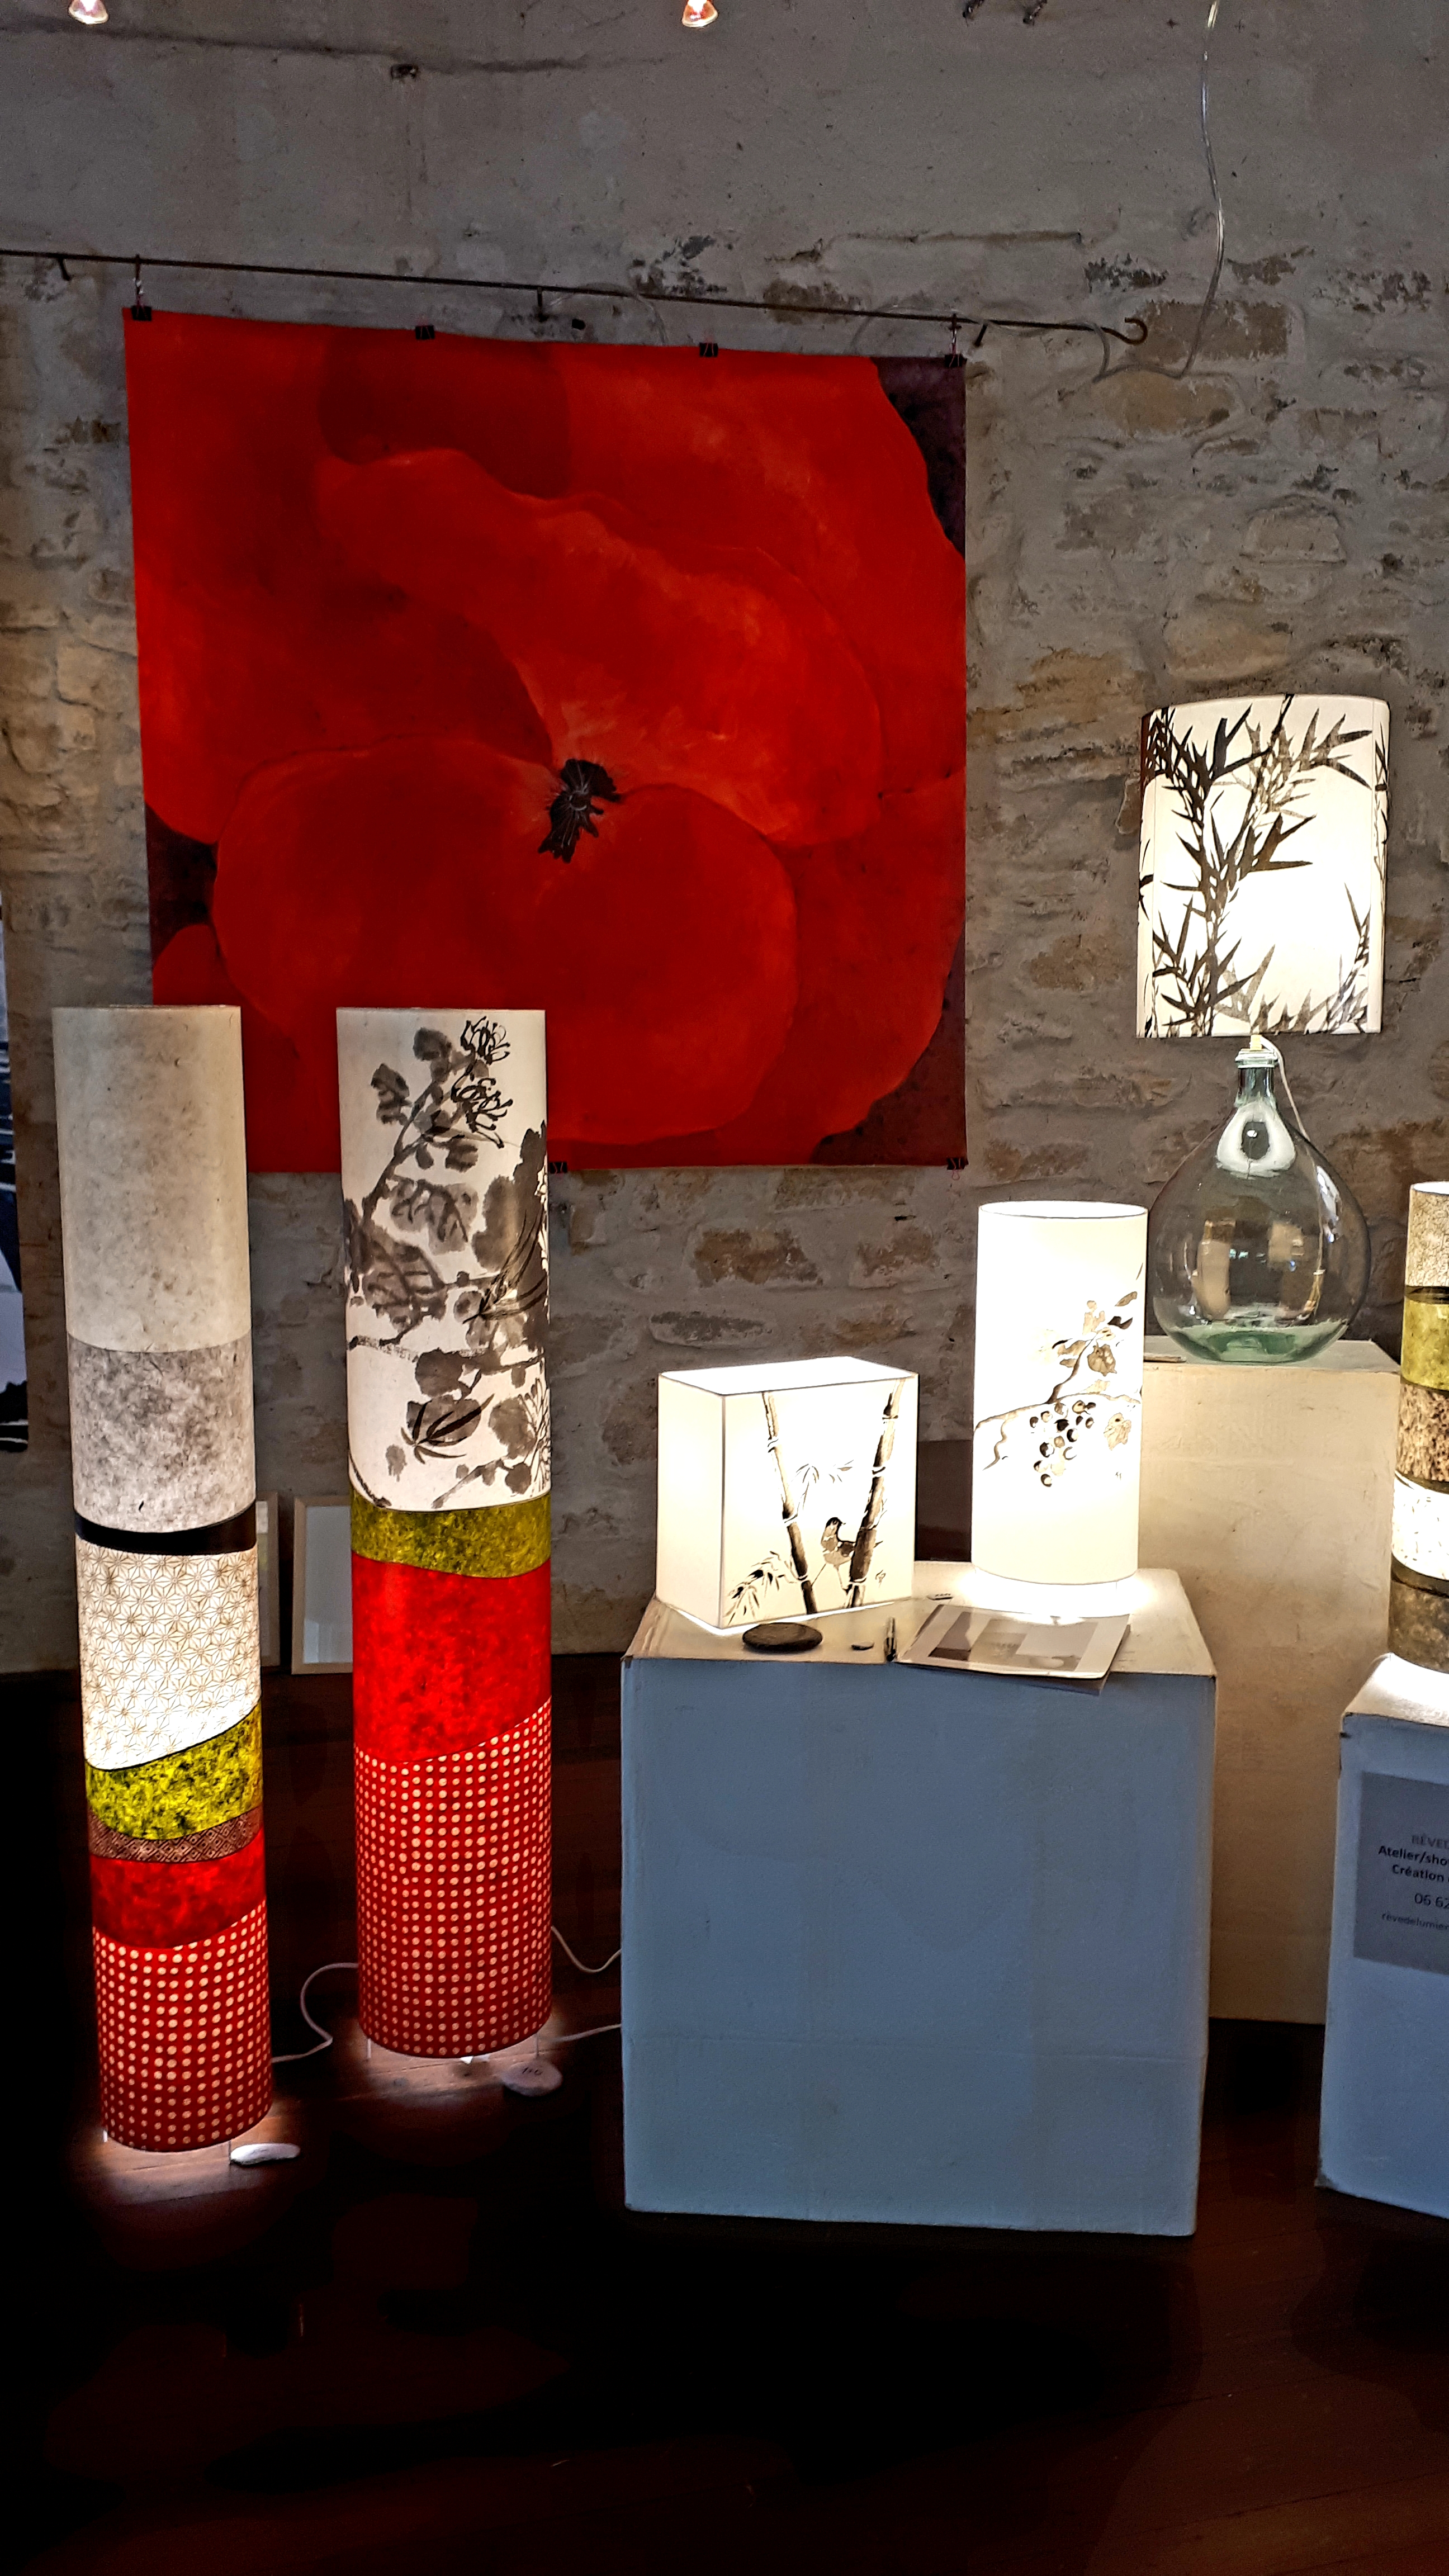 Exposition chemins d'Art